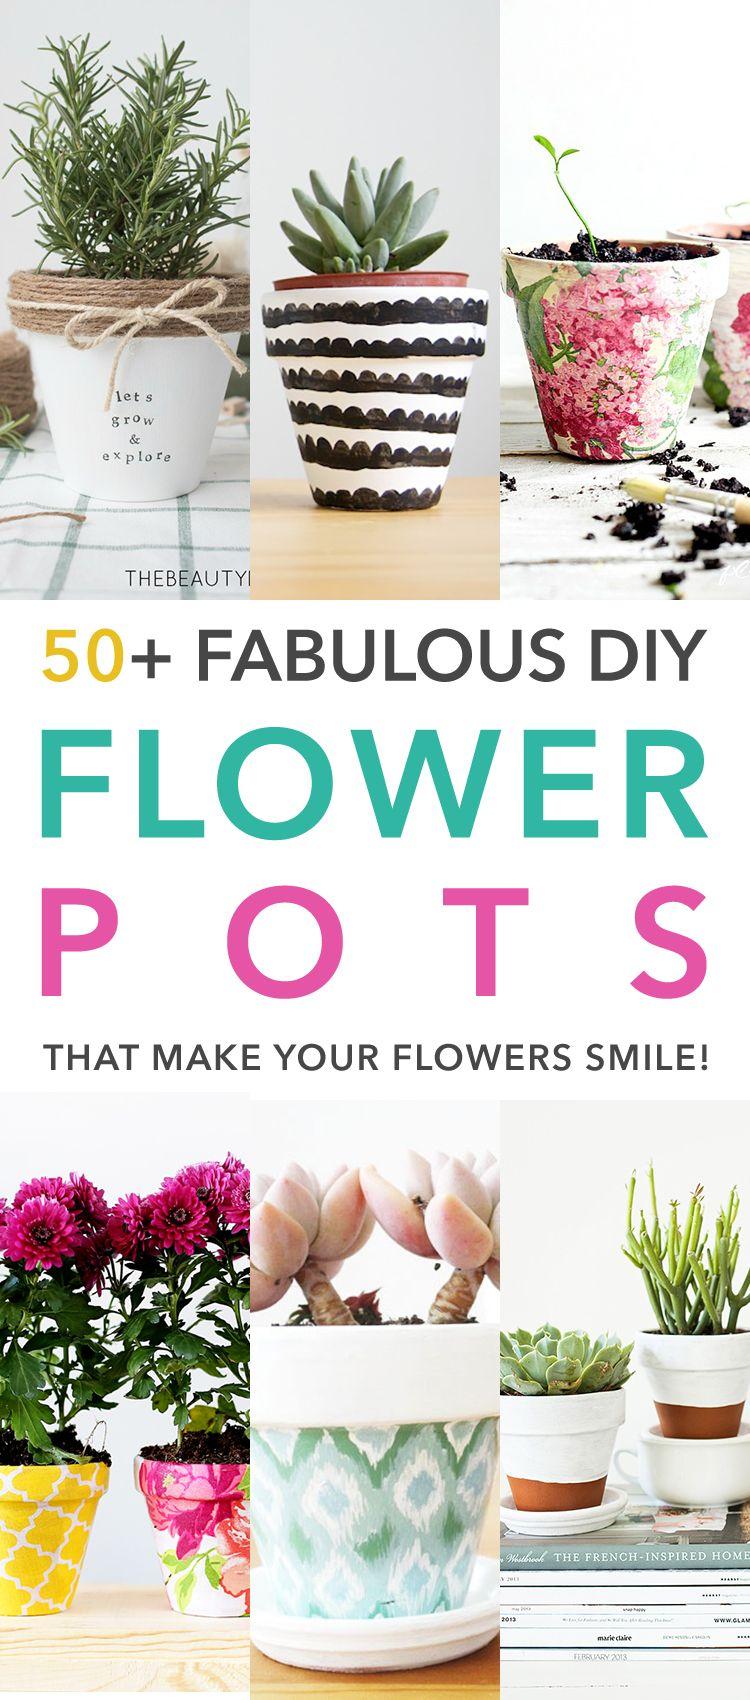 50+ Fabulous DIY Flower Pots That Make Your Flowers Smile | Diy ...